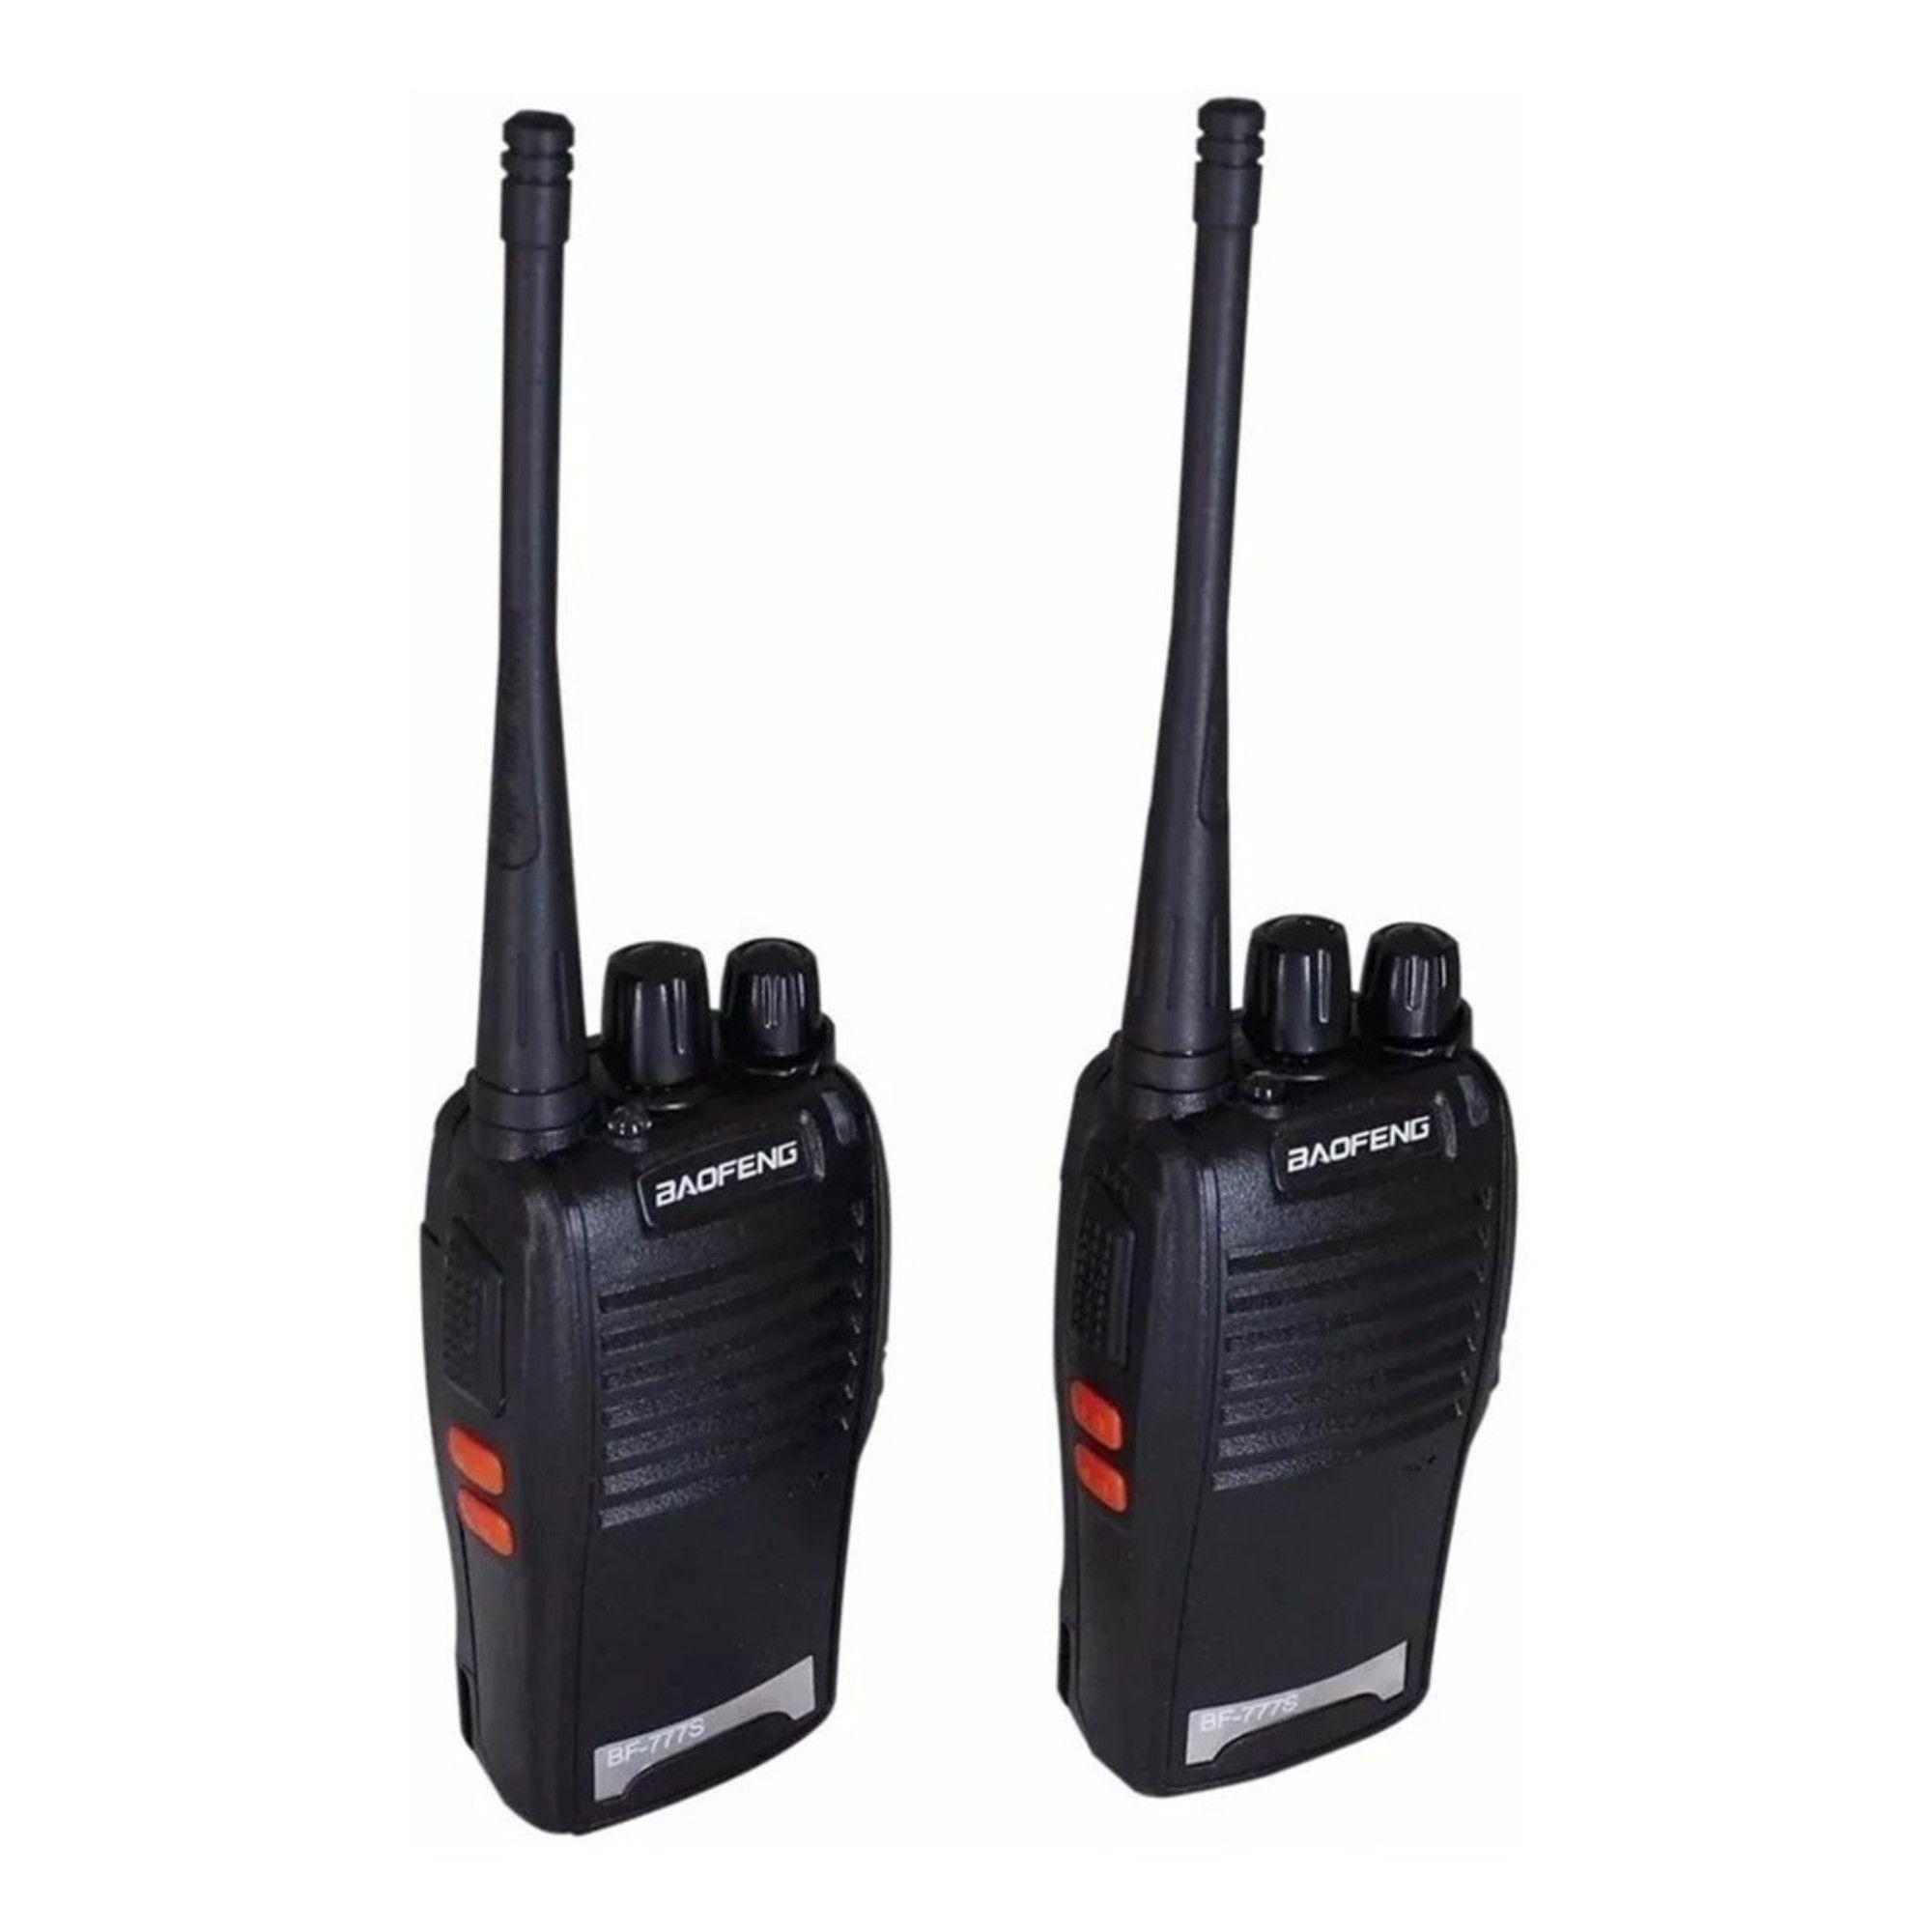 Kit 2 Radio Comunicador Baofeng 777s Profissional Ht Uhf 16 Canais